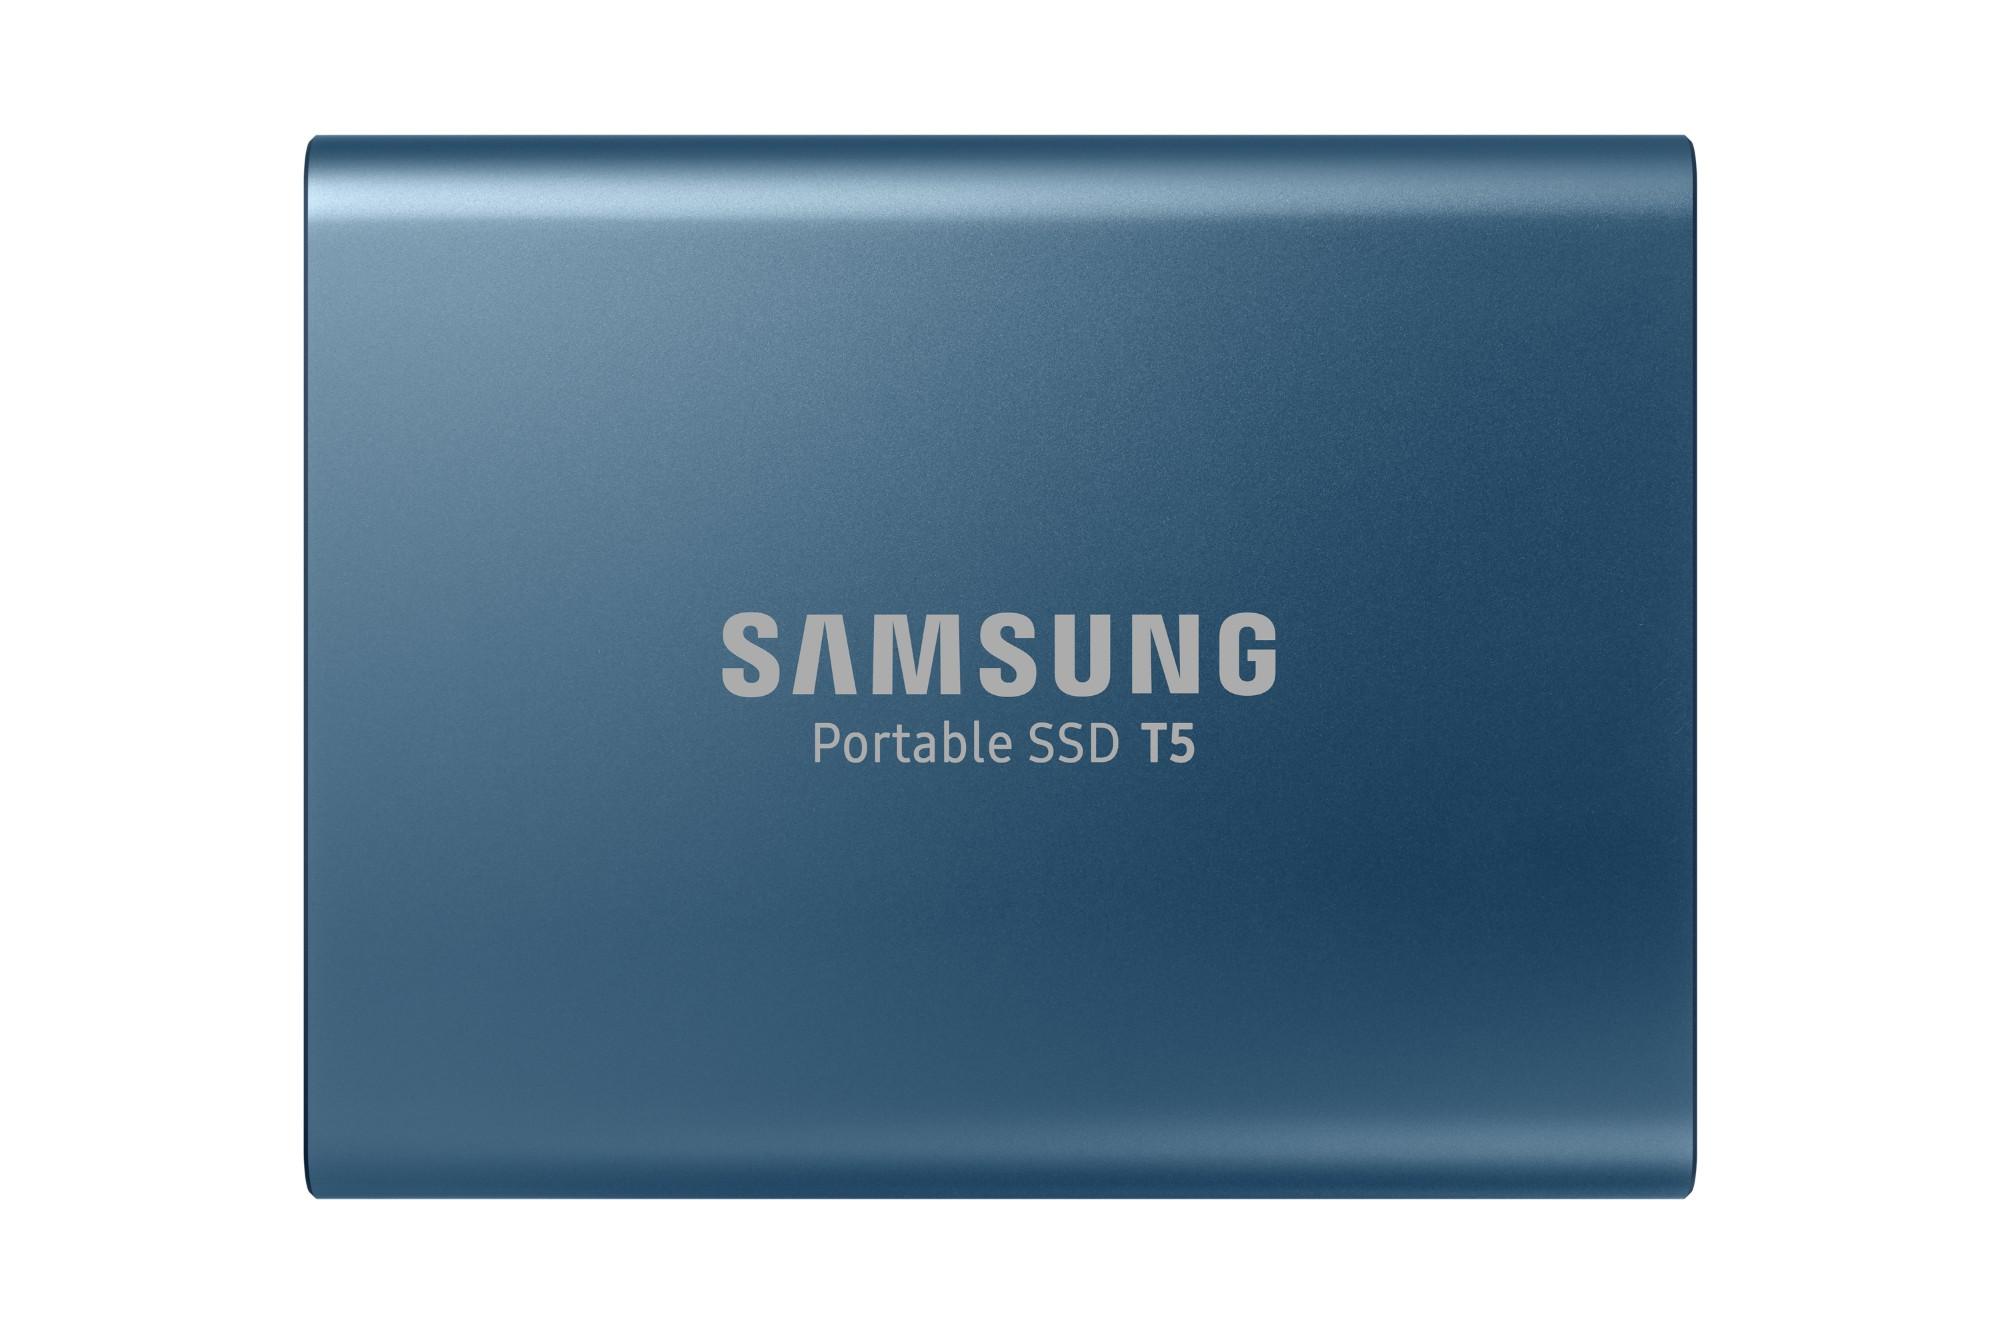 Portable SSD T5 USB 3 250gb